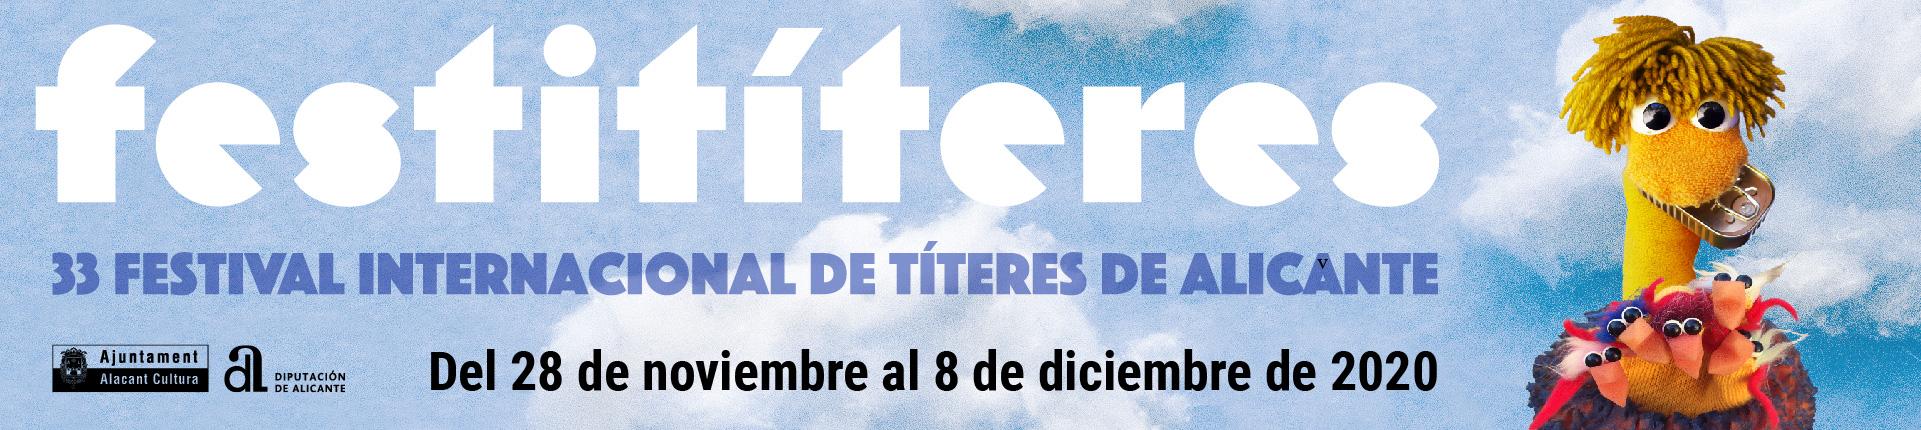 "Festival Internacional de Títeres ""Festititeres"""